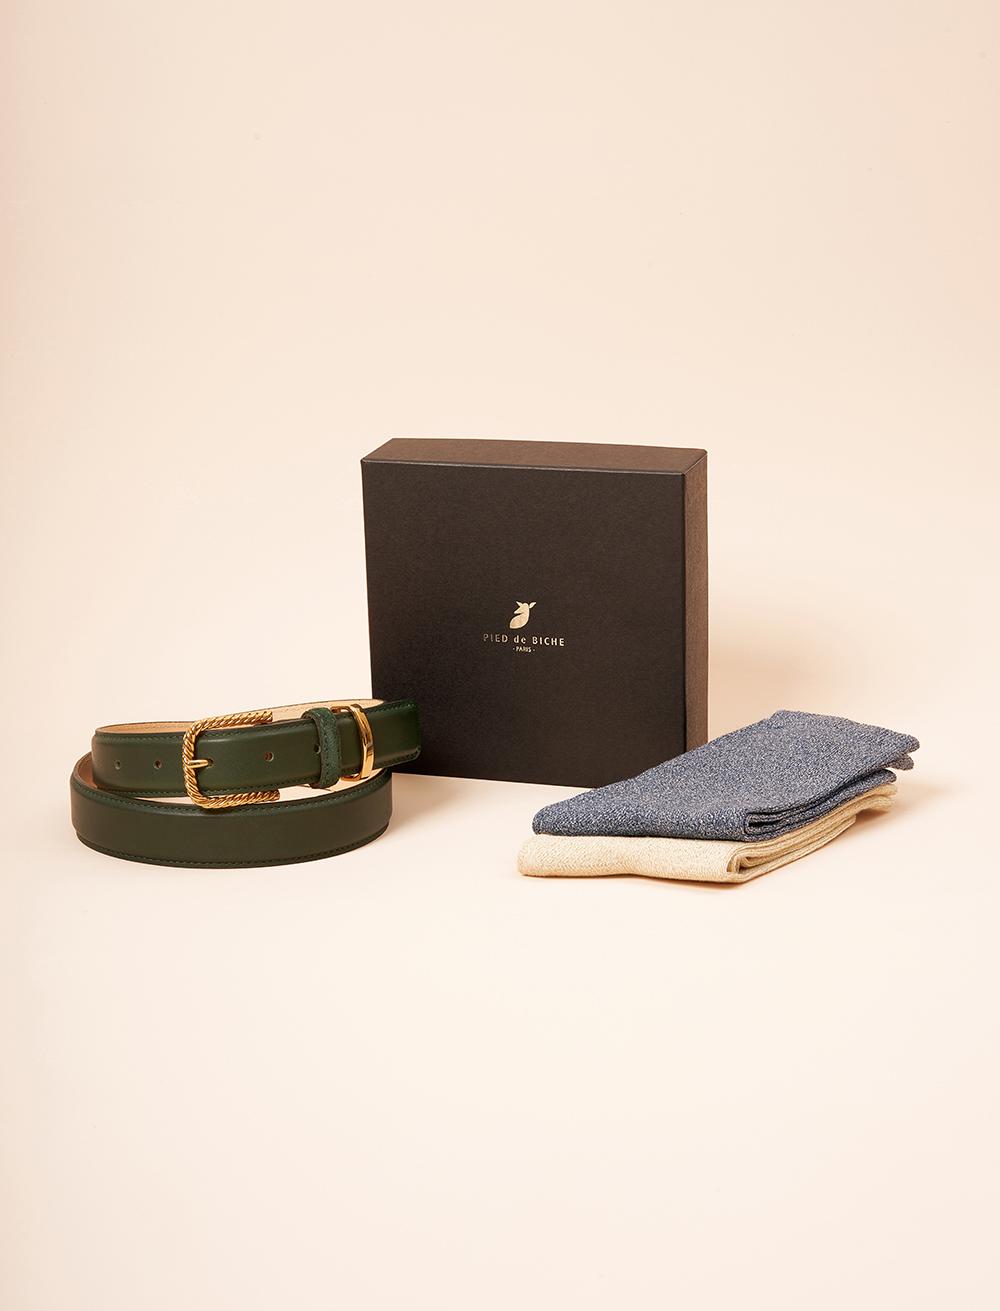 Christmas gift box - Twisted belt and glitter socket